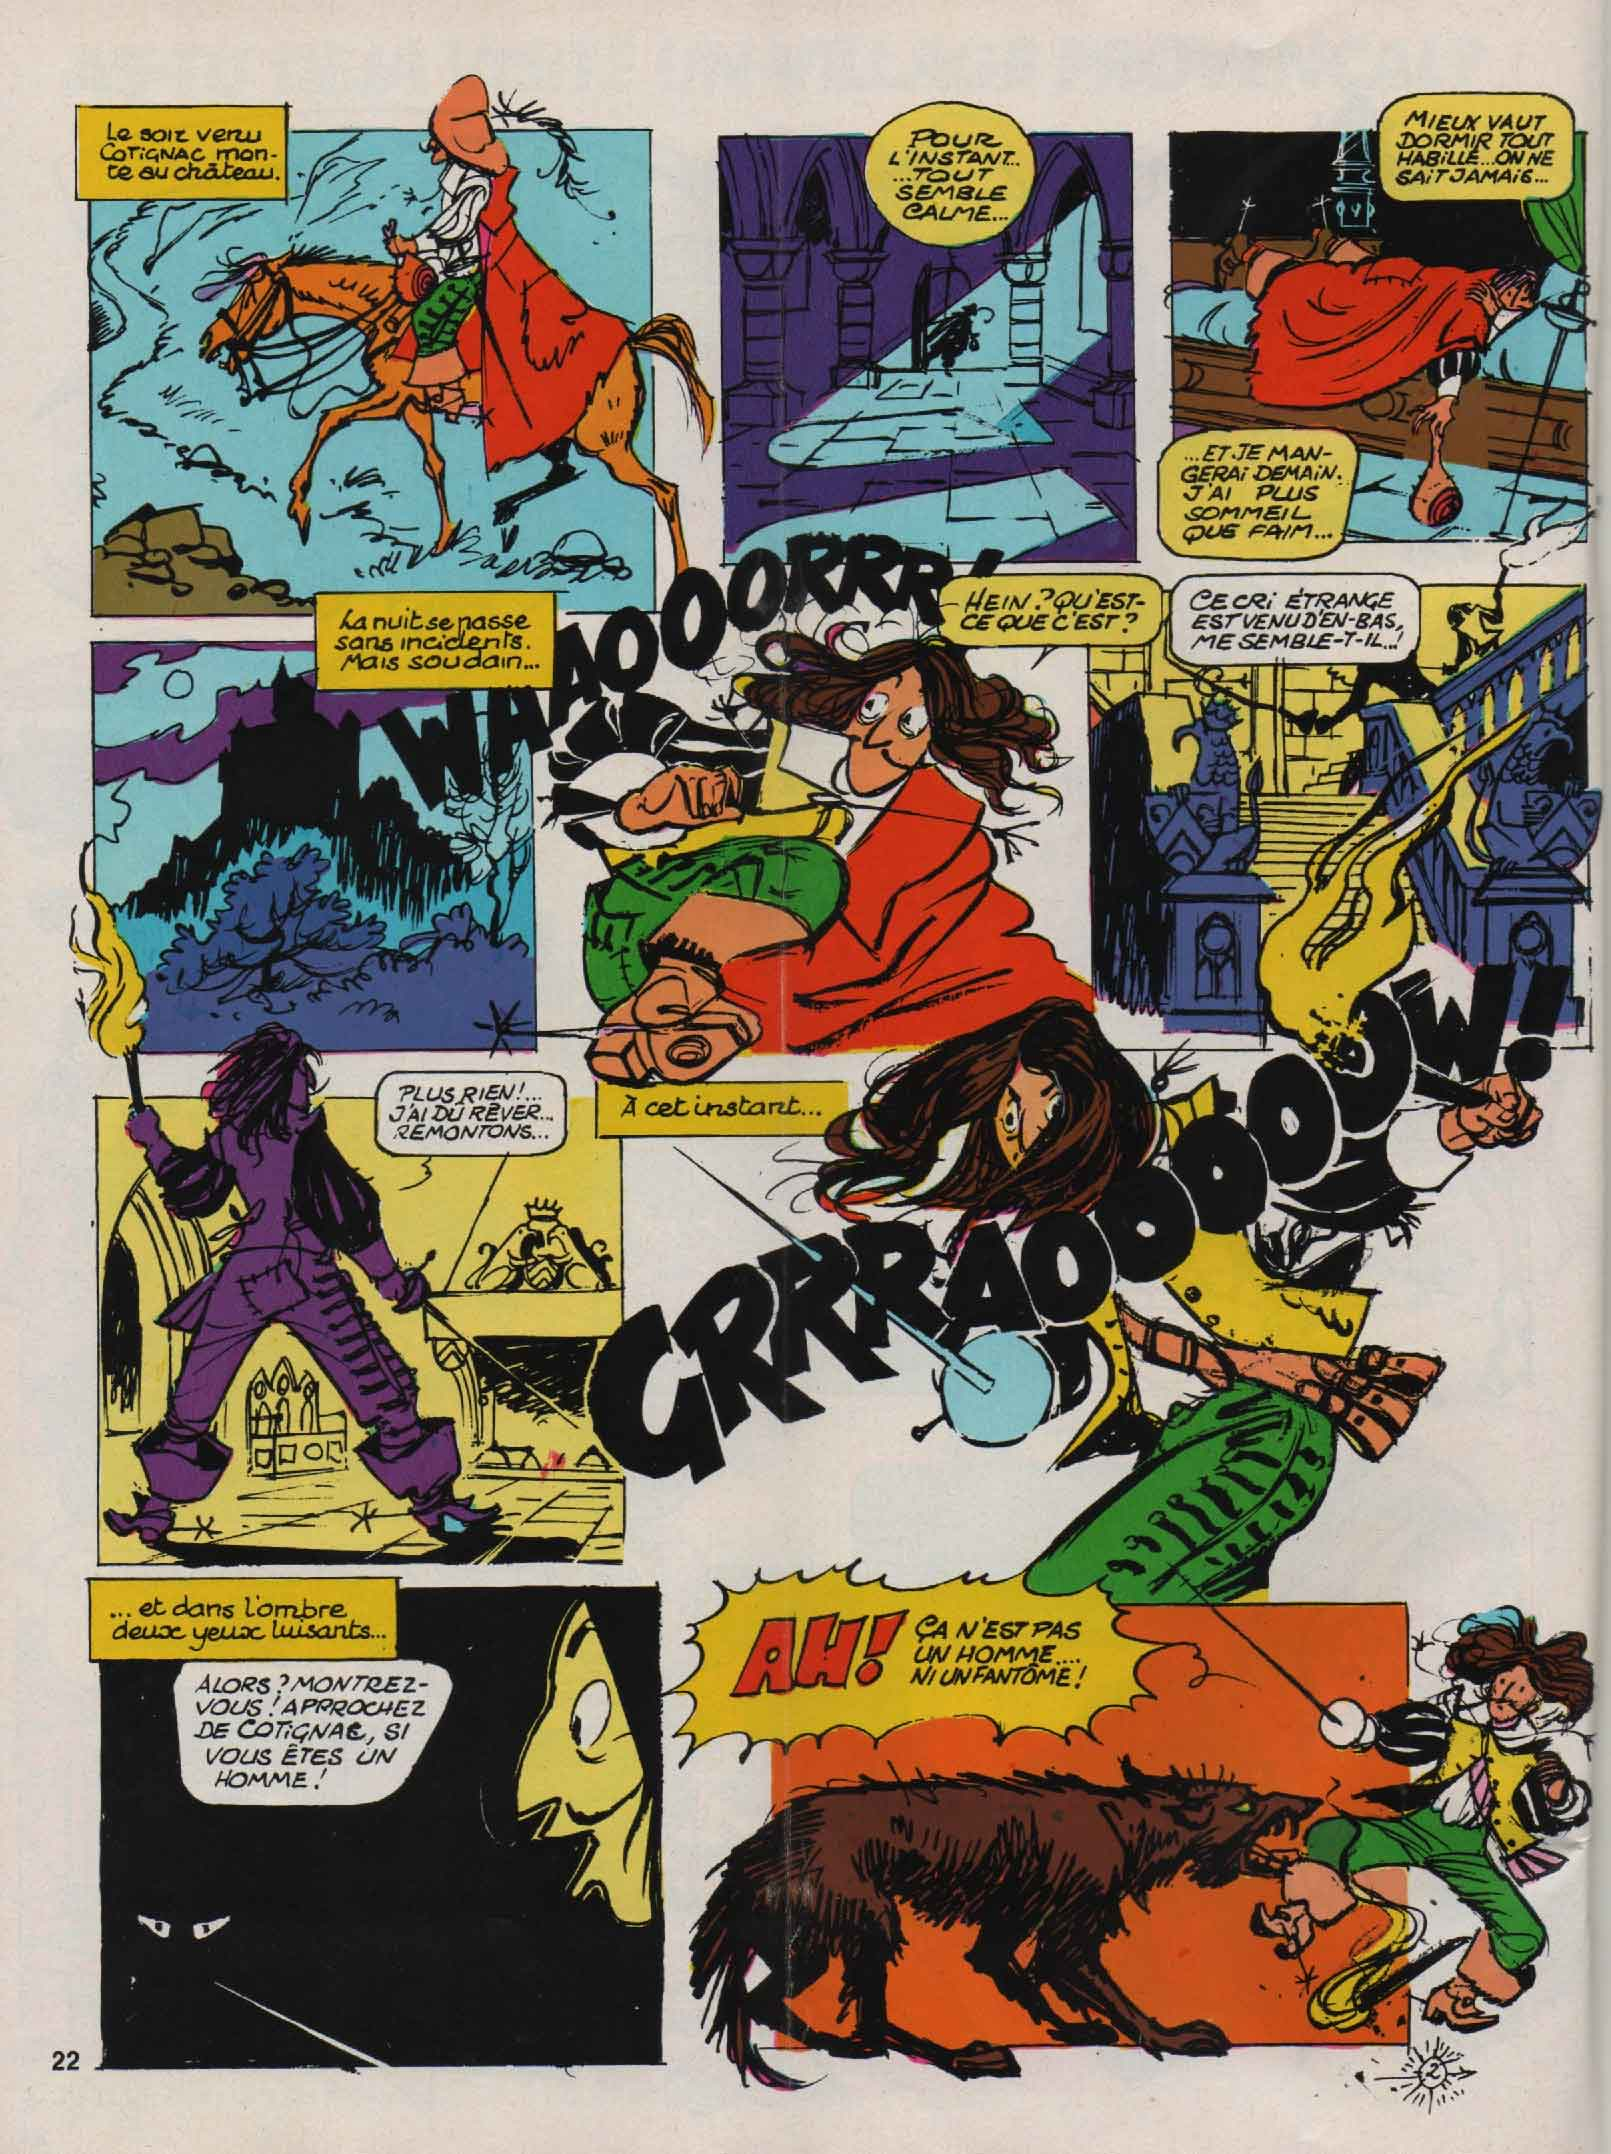 « Cotignac » Fripounet n° 3 (21/01/1976).